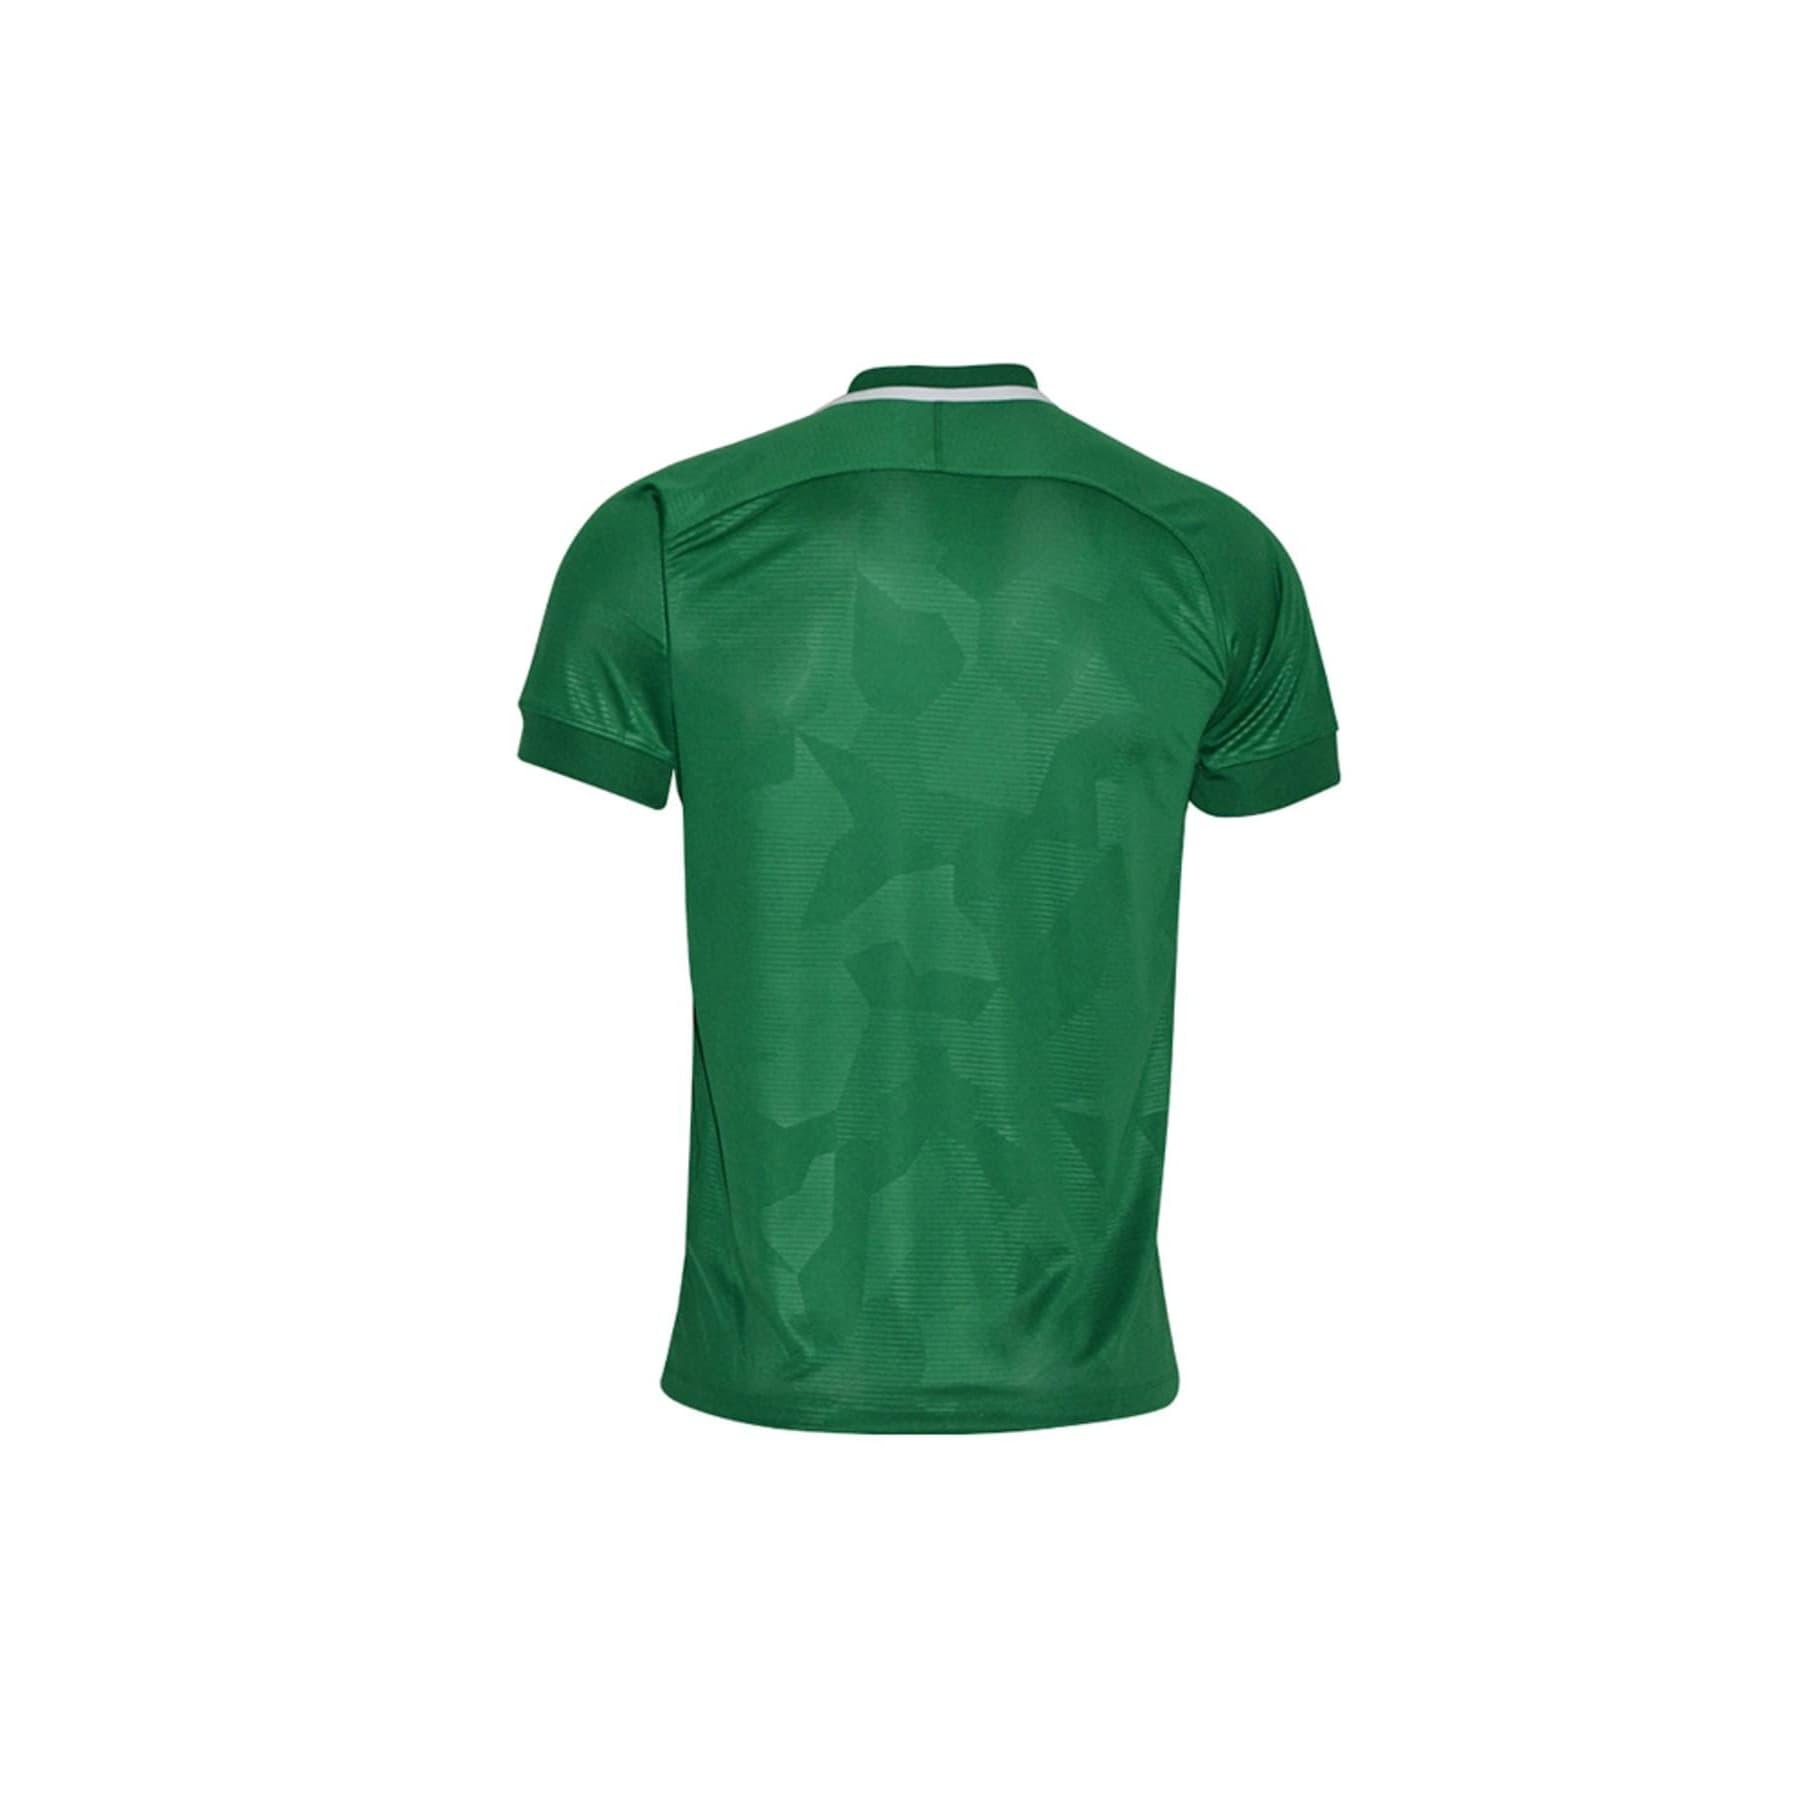 Dry Challenge II Yeşil Futbol Forma (893964-341)